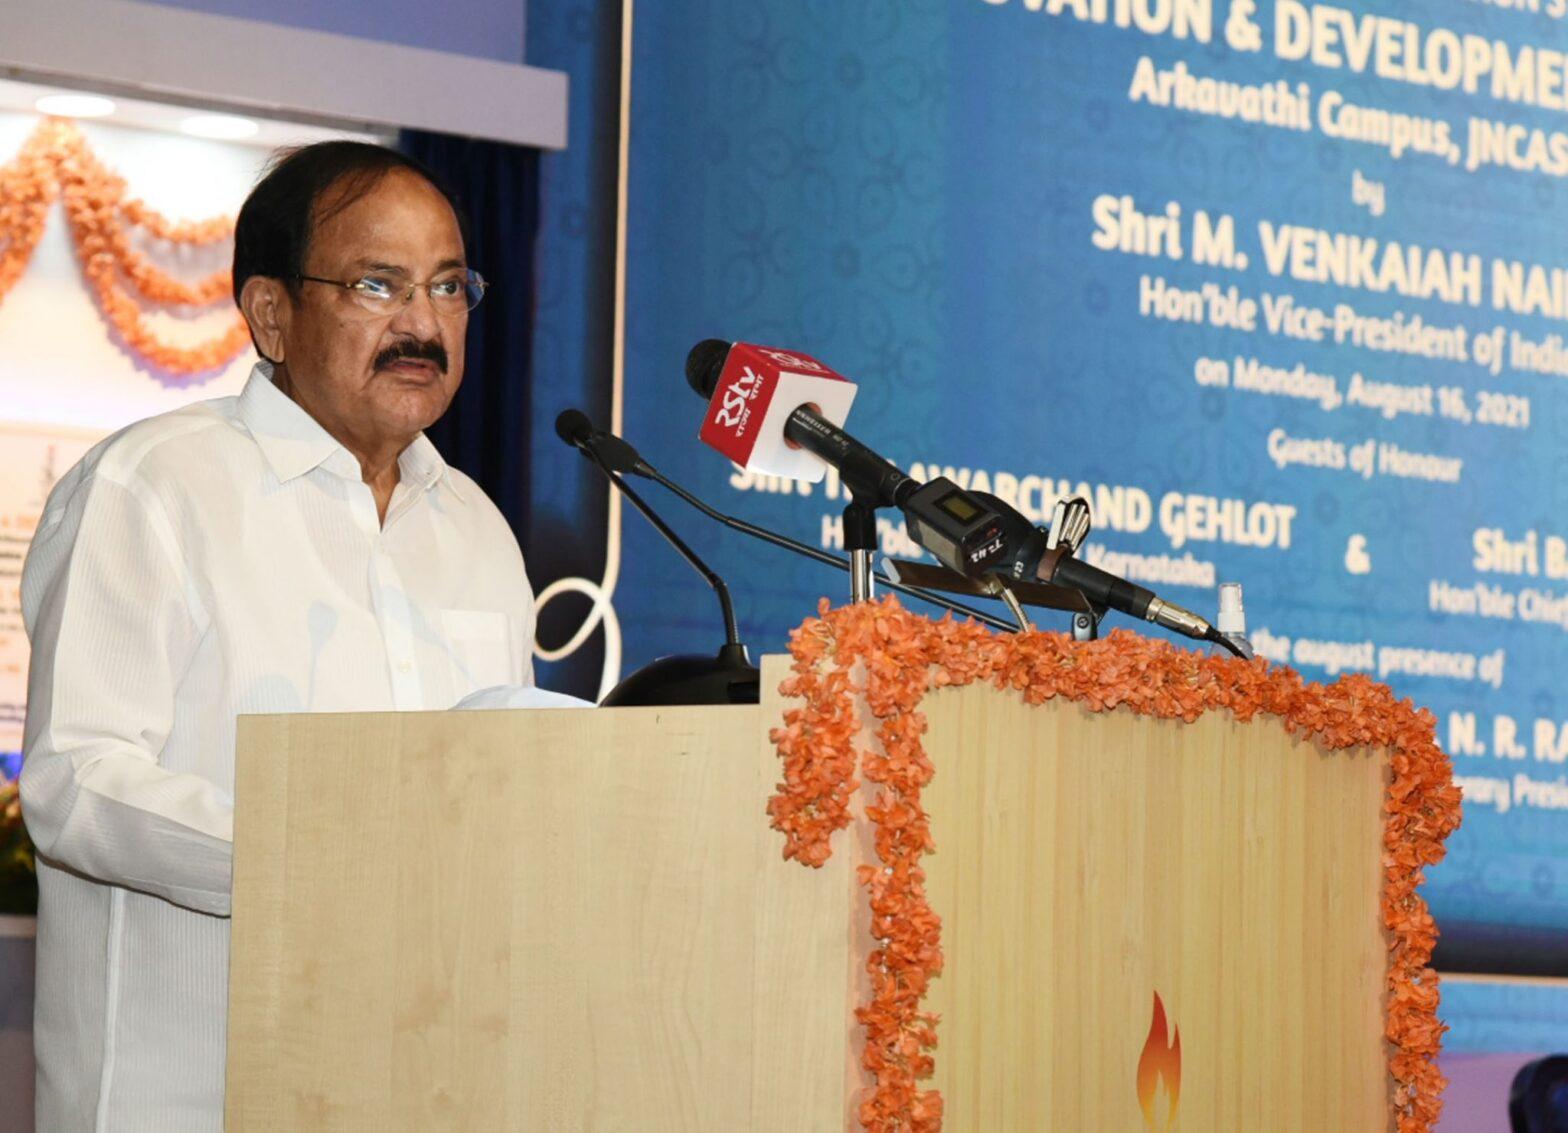 Venkaiah Naidu laid foundation stone of Innovation and Development Centre| വെങ്കയ്യ നായിഡു ഇന്നവേഷൻ ആൻഡ് ഡെവലപ്മെന്റ് സെന്ററിന്റെ ശിലാസ്ഥാപനം നിർവഹിച്ചു_40.1